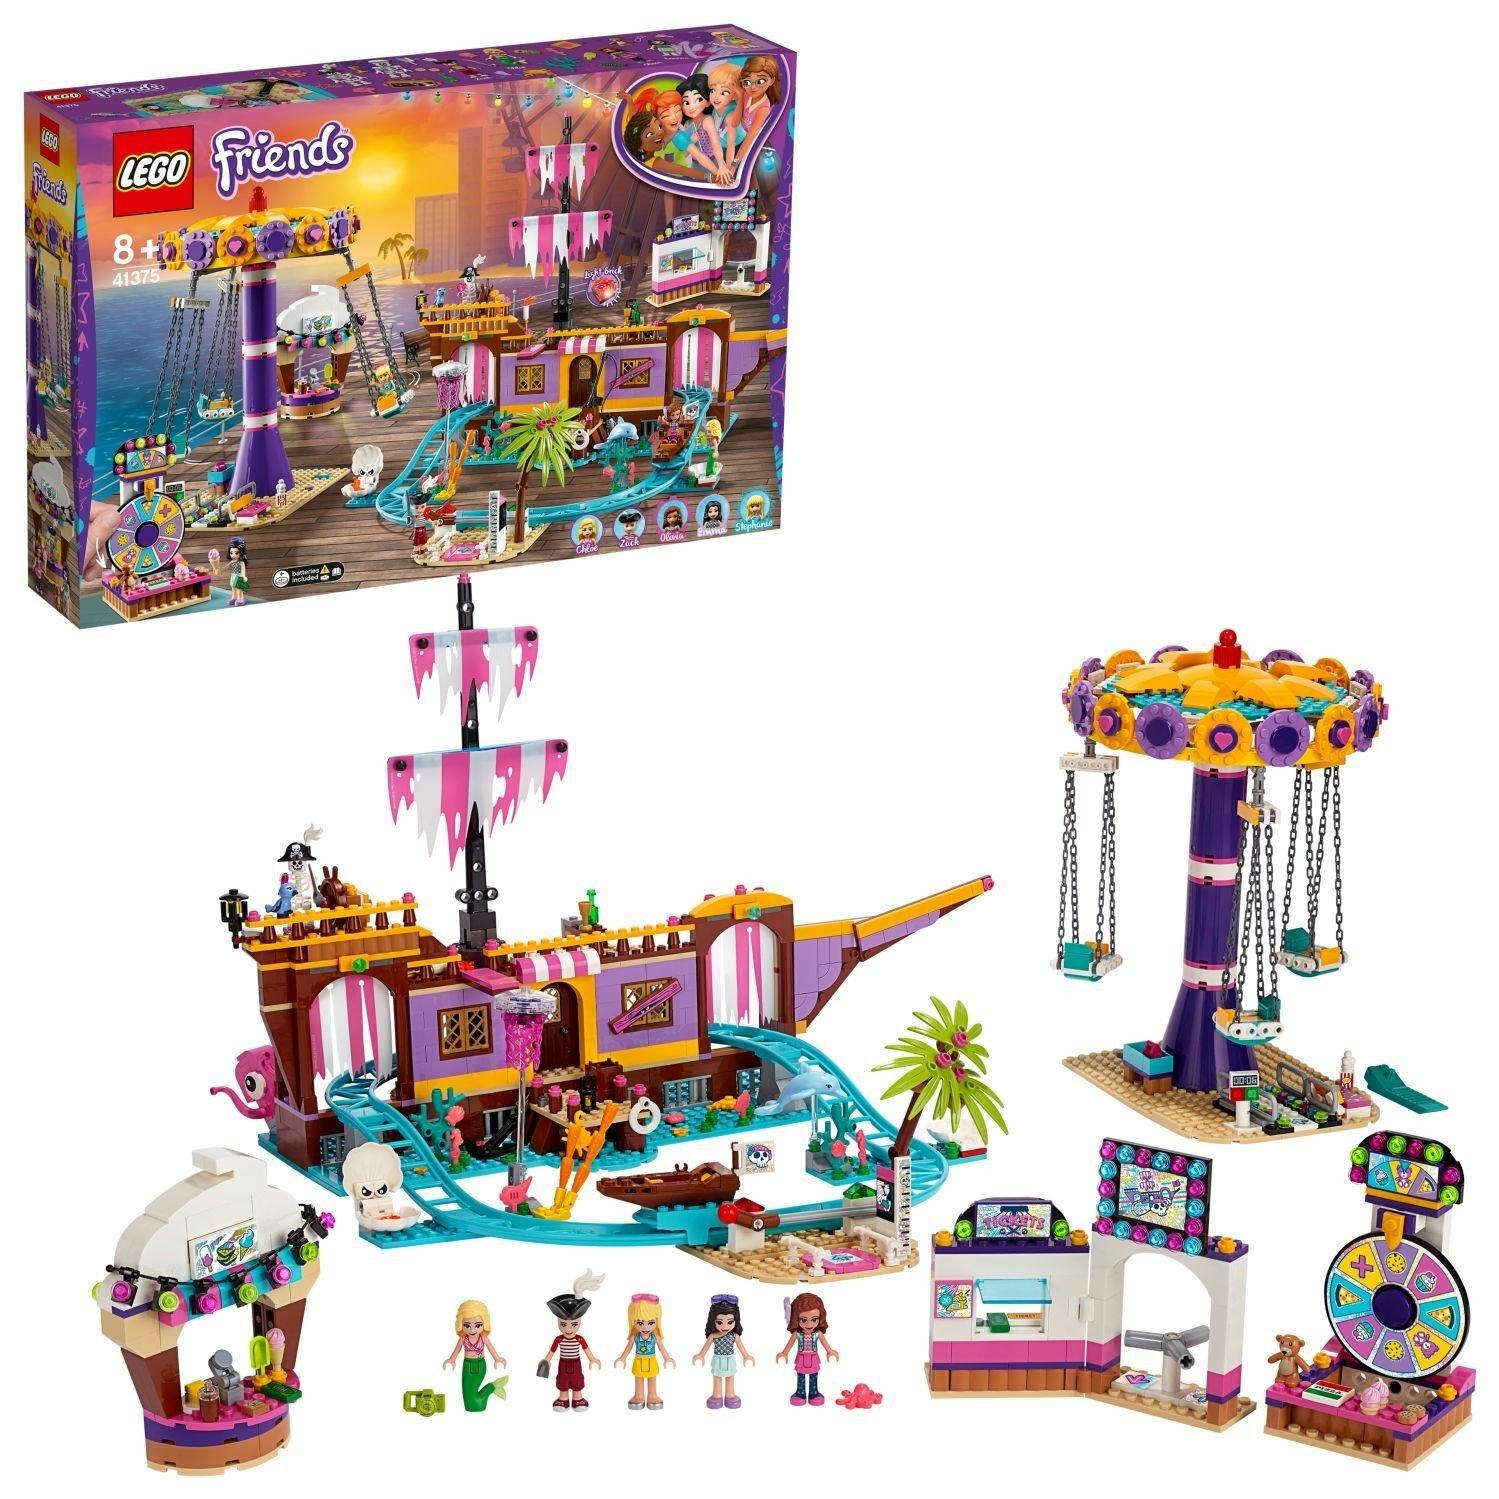 LEGO Friends Heartlake City Pier Playset 41375 - £70.45 delivered @ Argos